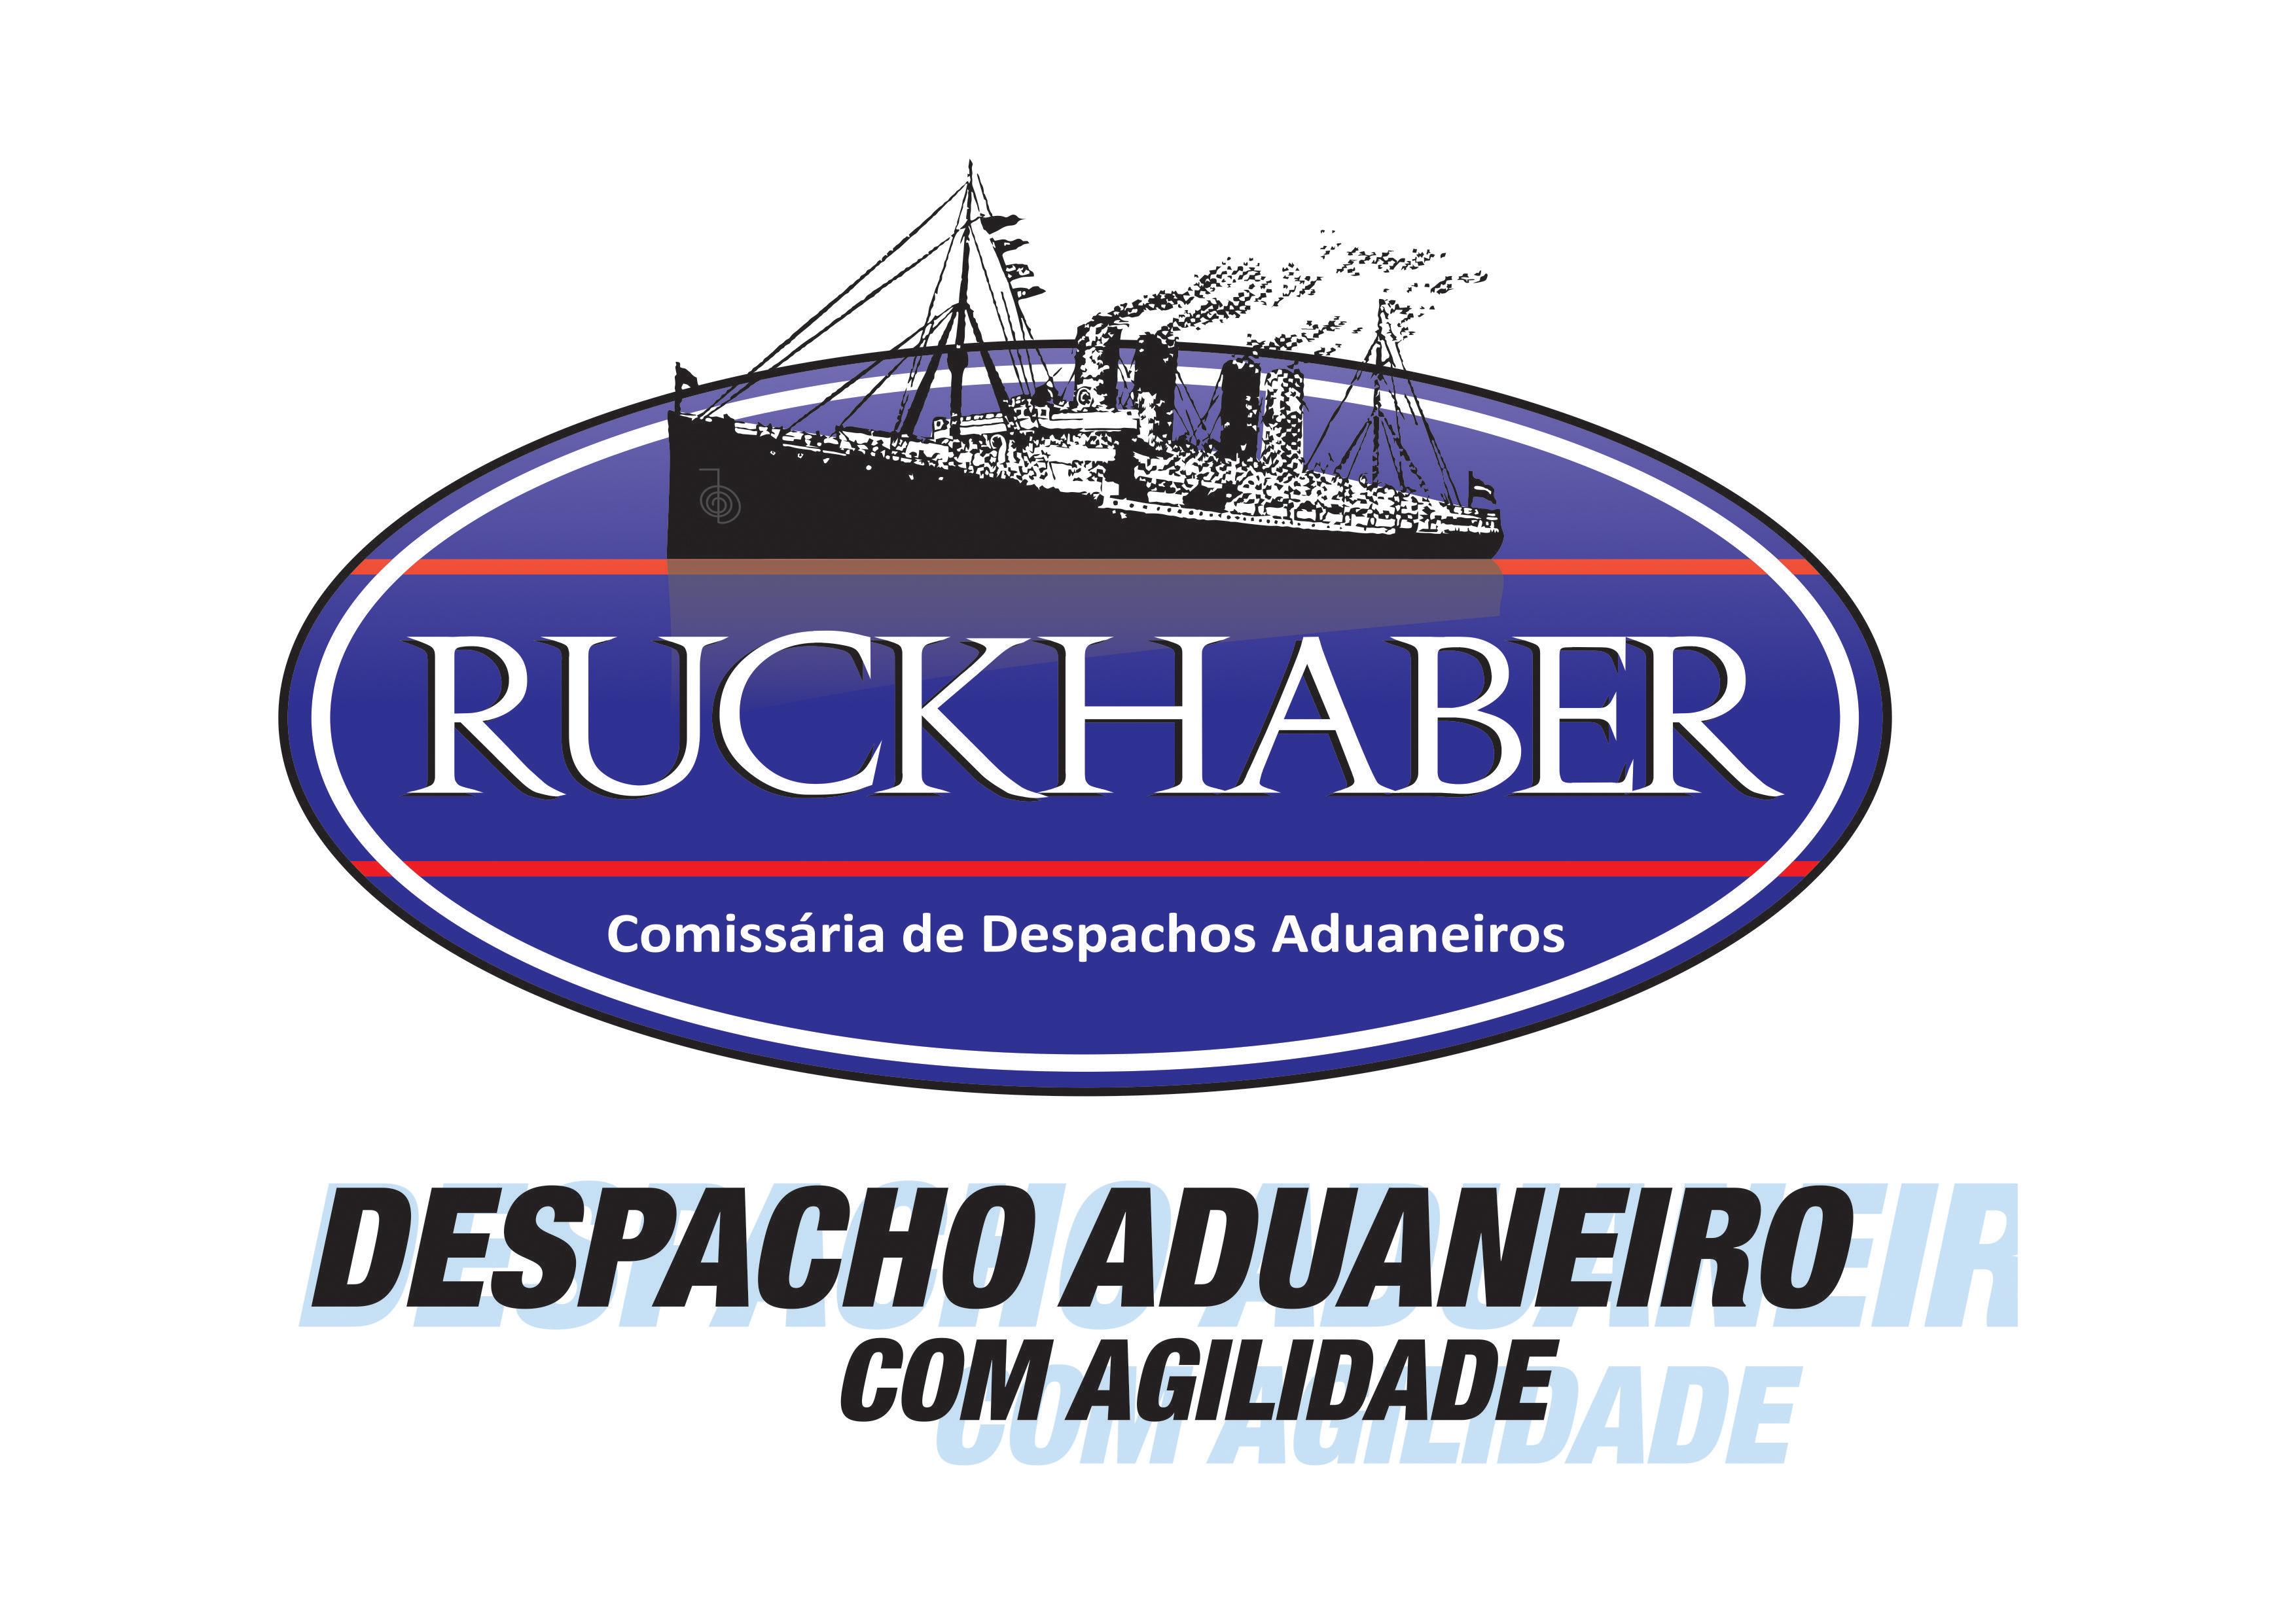 Logomarca Ruckhaber